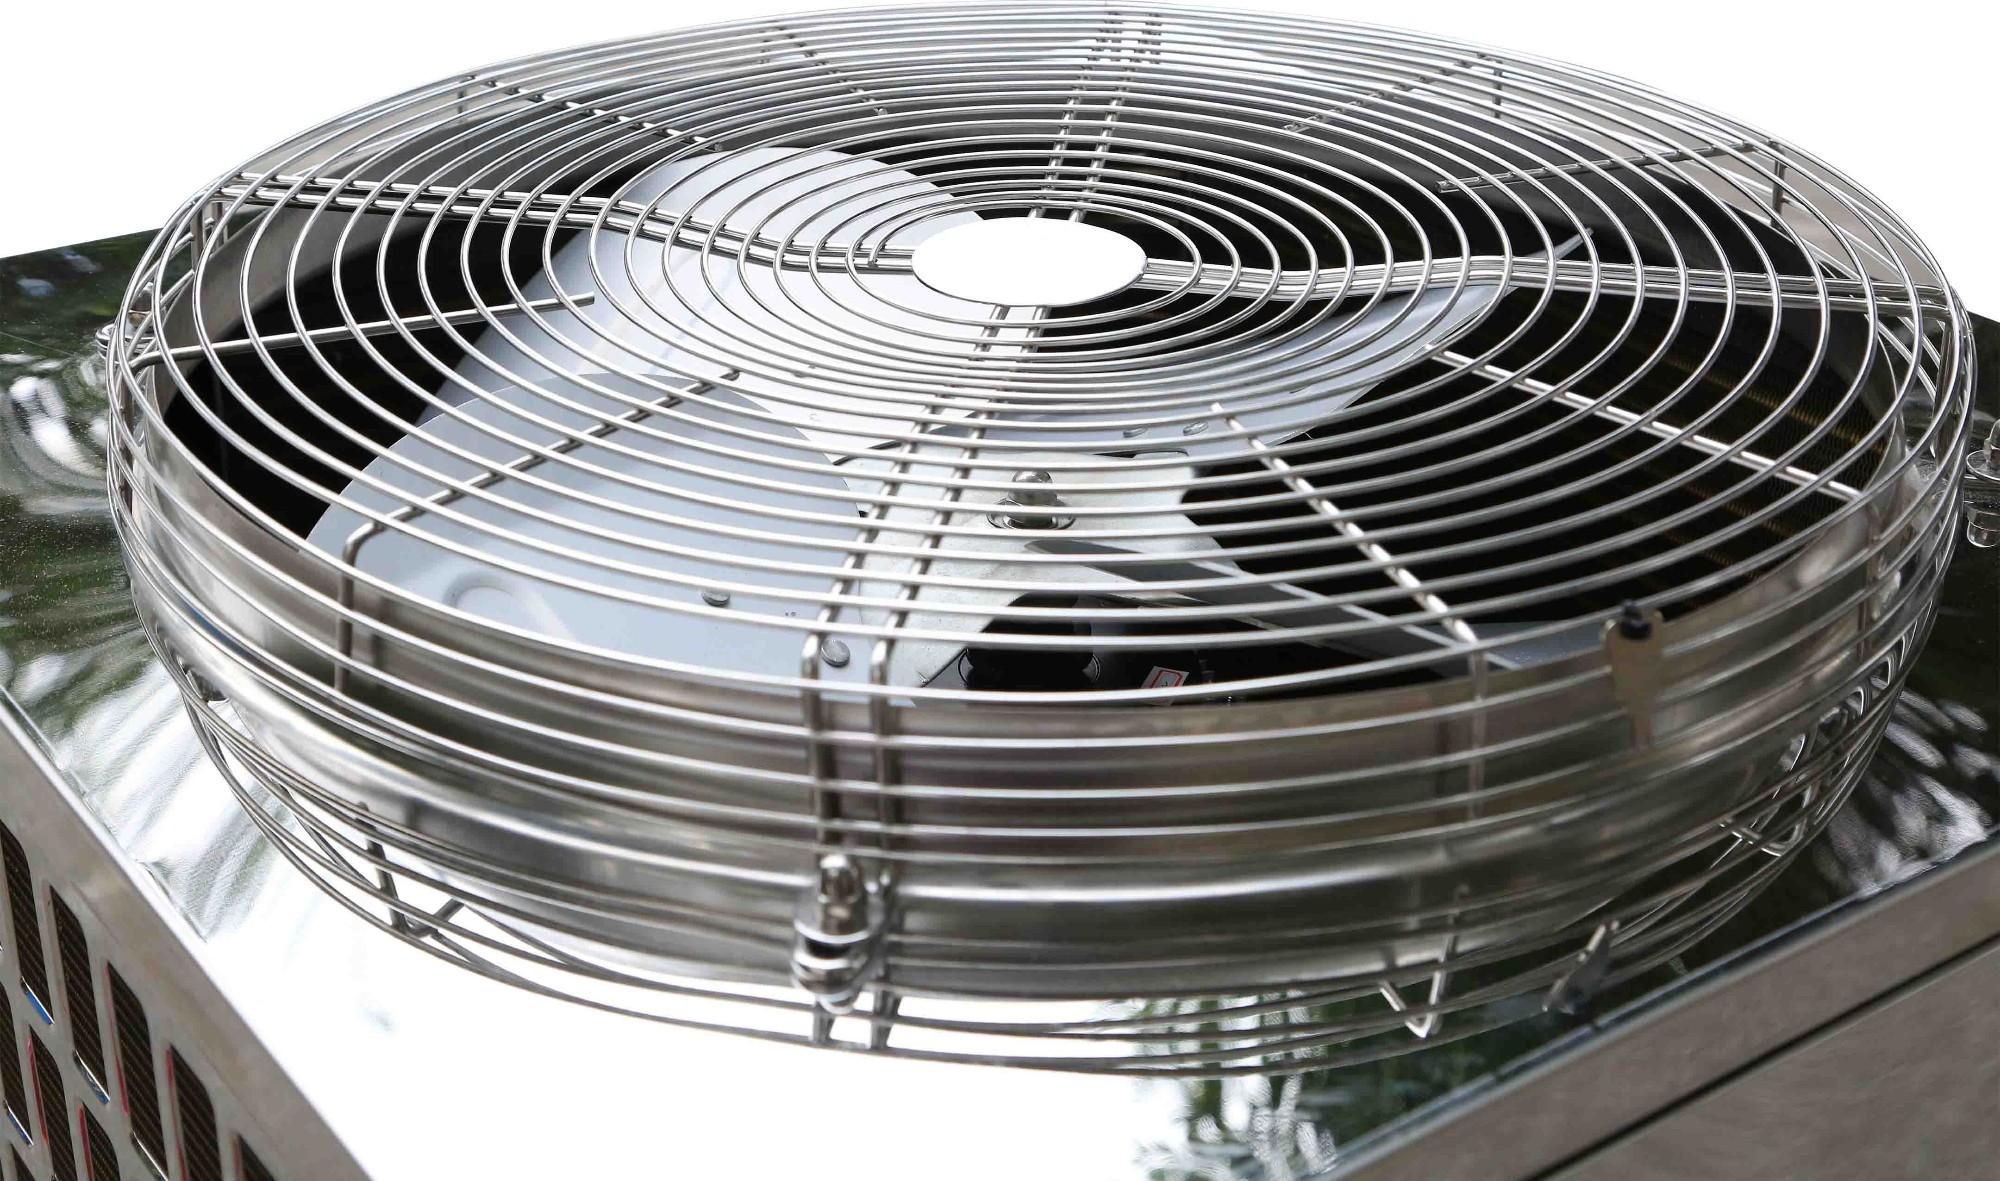 High quality energy saving techology  Low Temp Heater Quotes,China heat pump equipment Low Temp Heater Factory, pump equipmentLow Temp Heater Purchasing